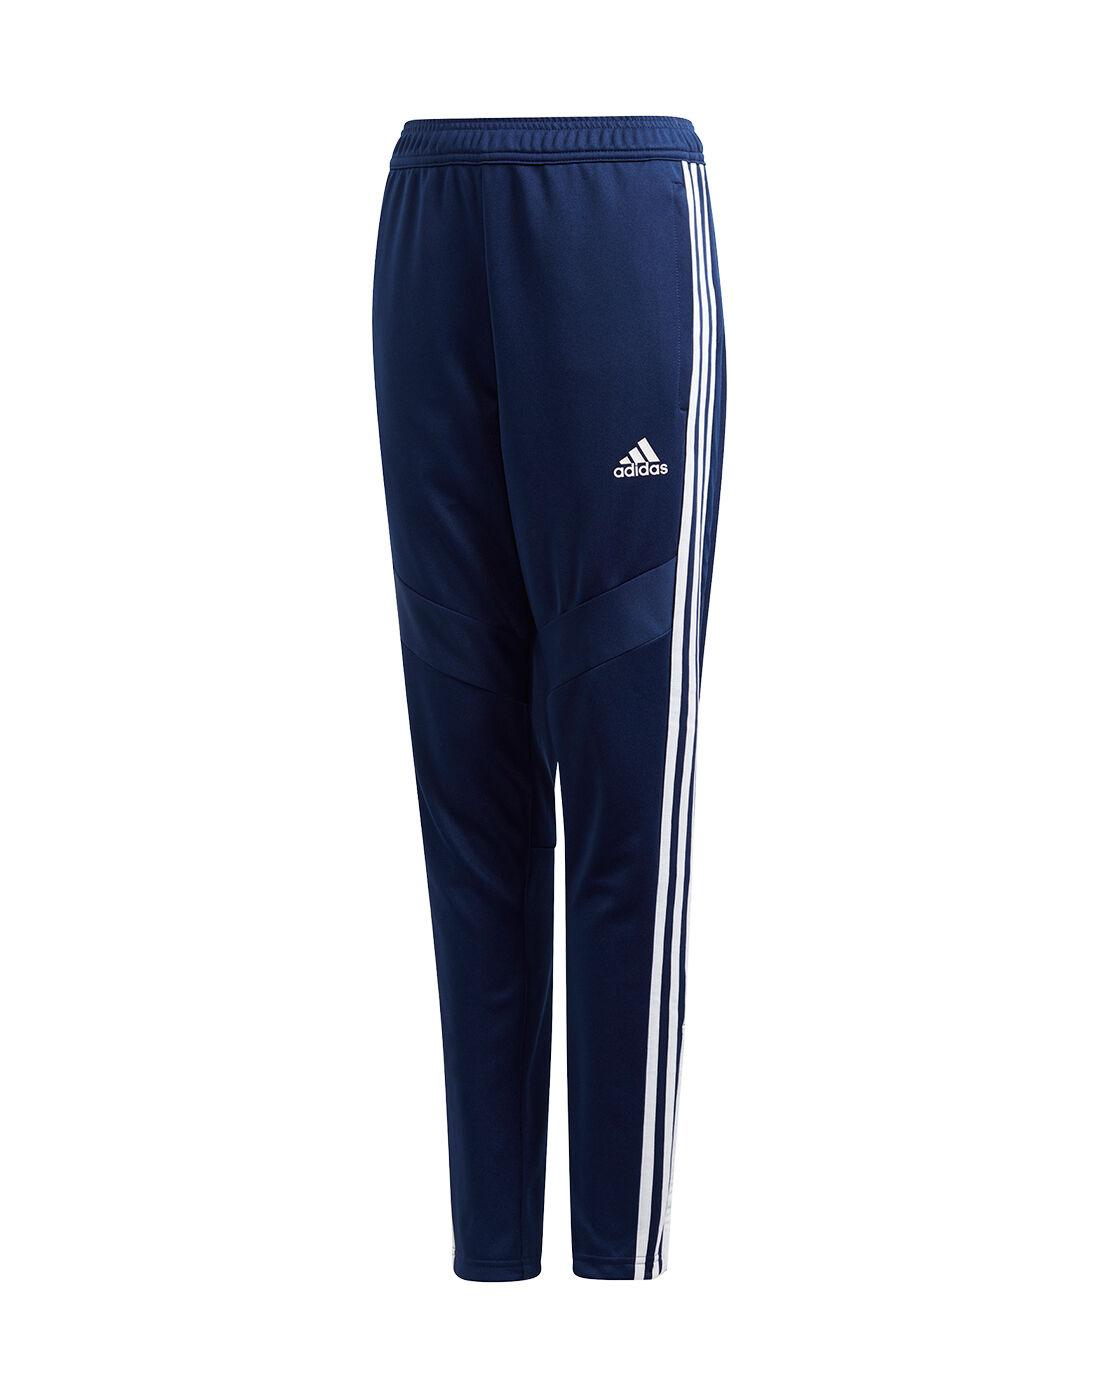 Boy's Navy Blue adidas Tiro Track Pants